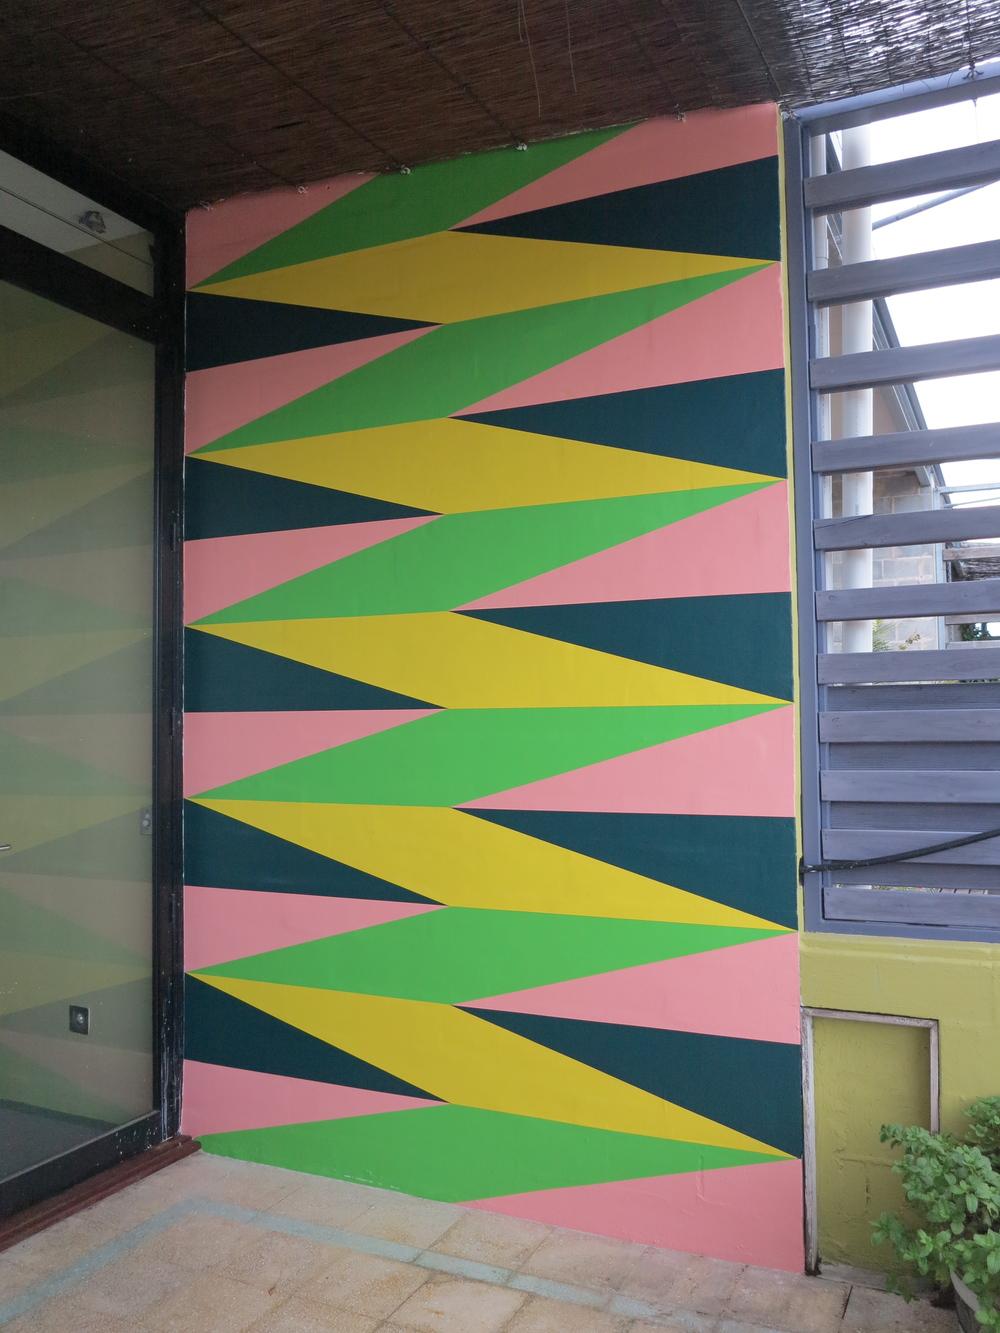 Damichi-Charles St wall A #1.jpg